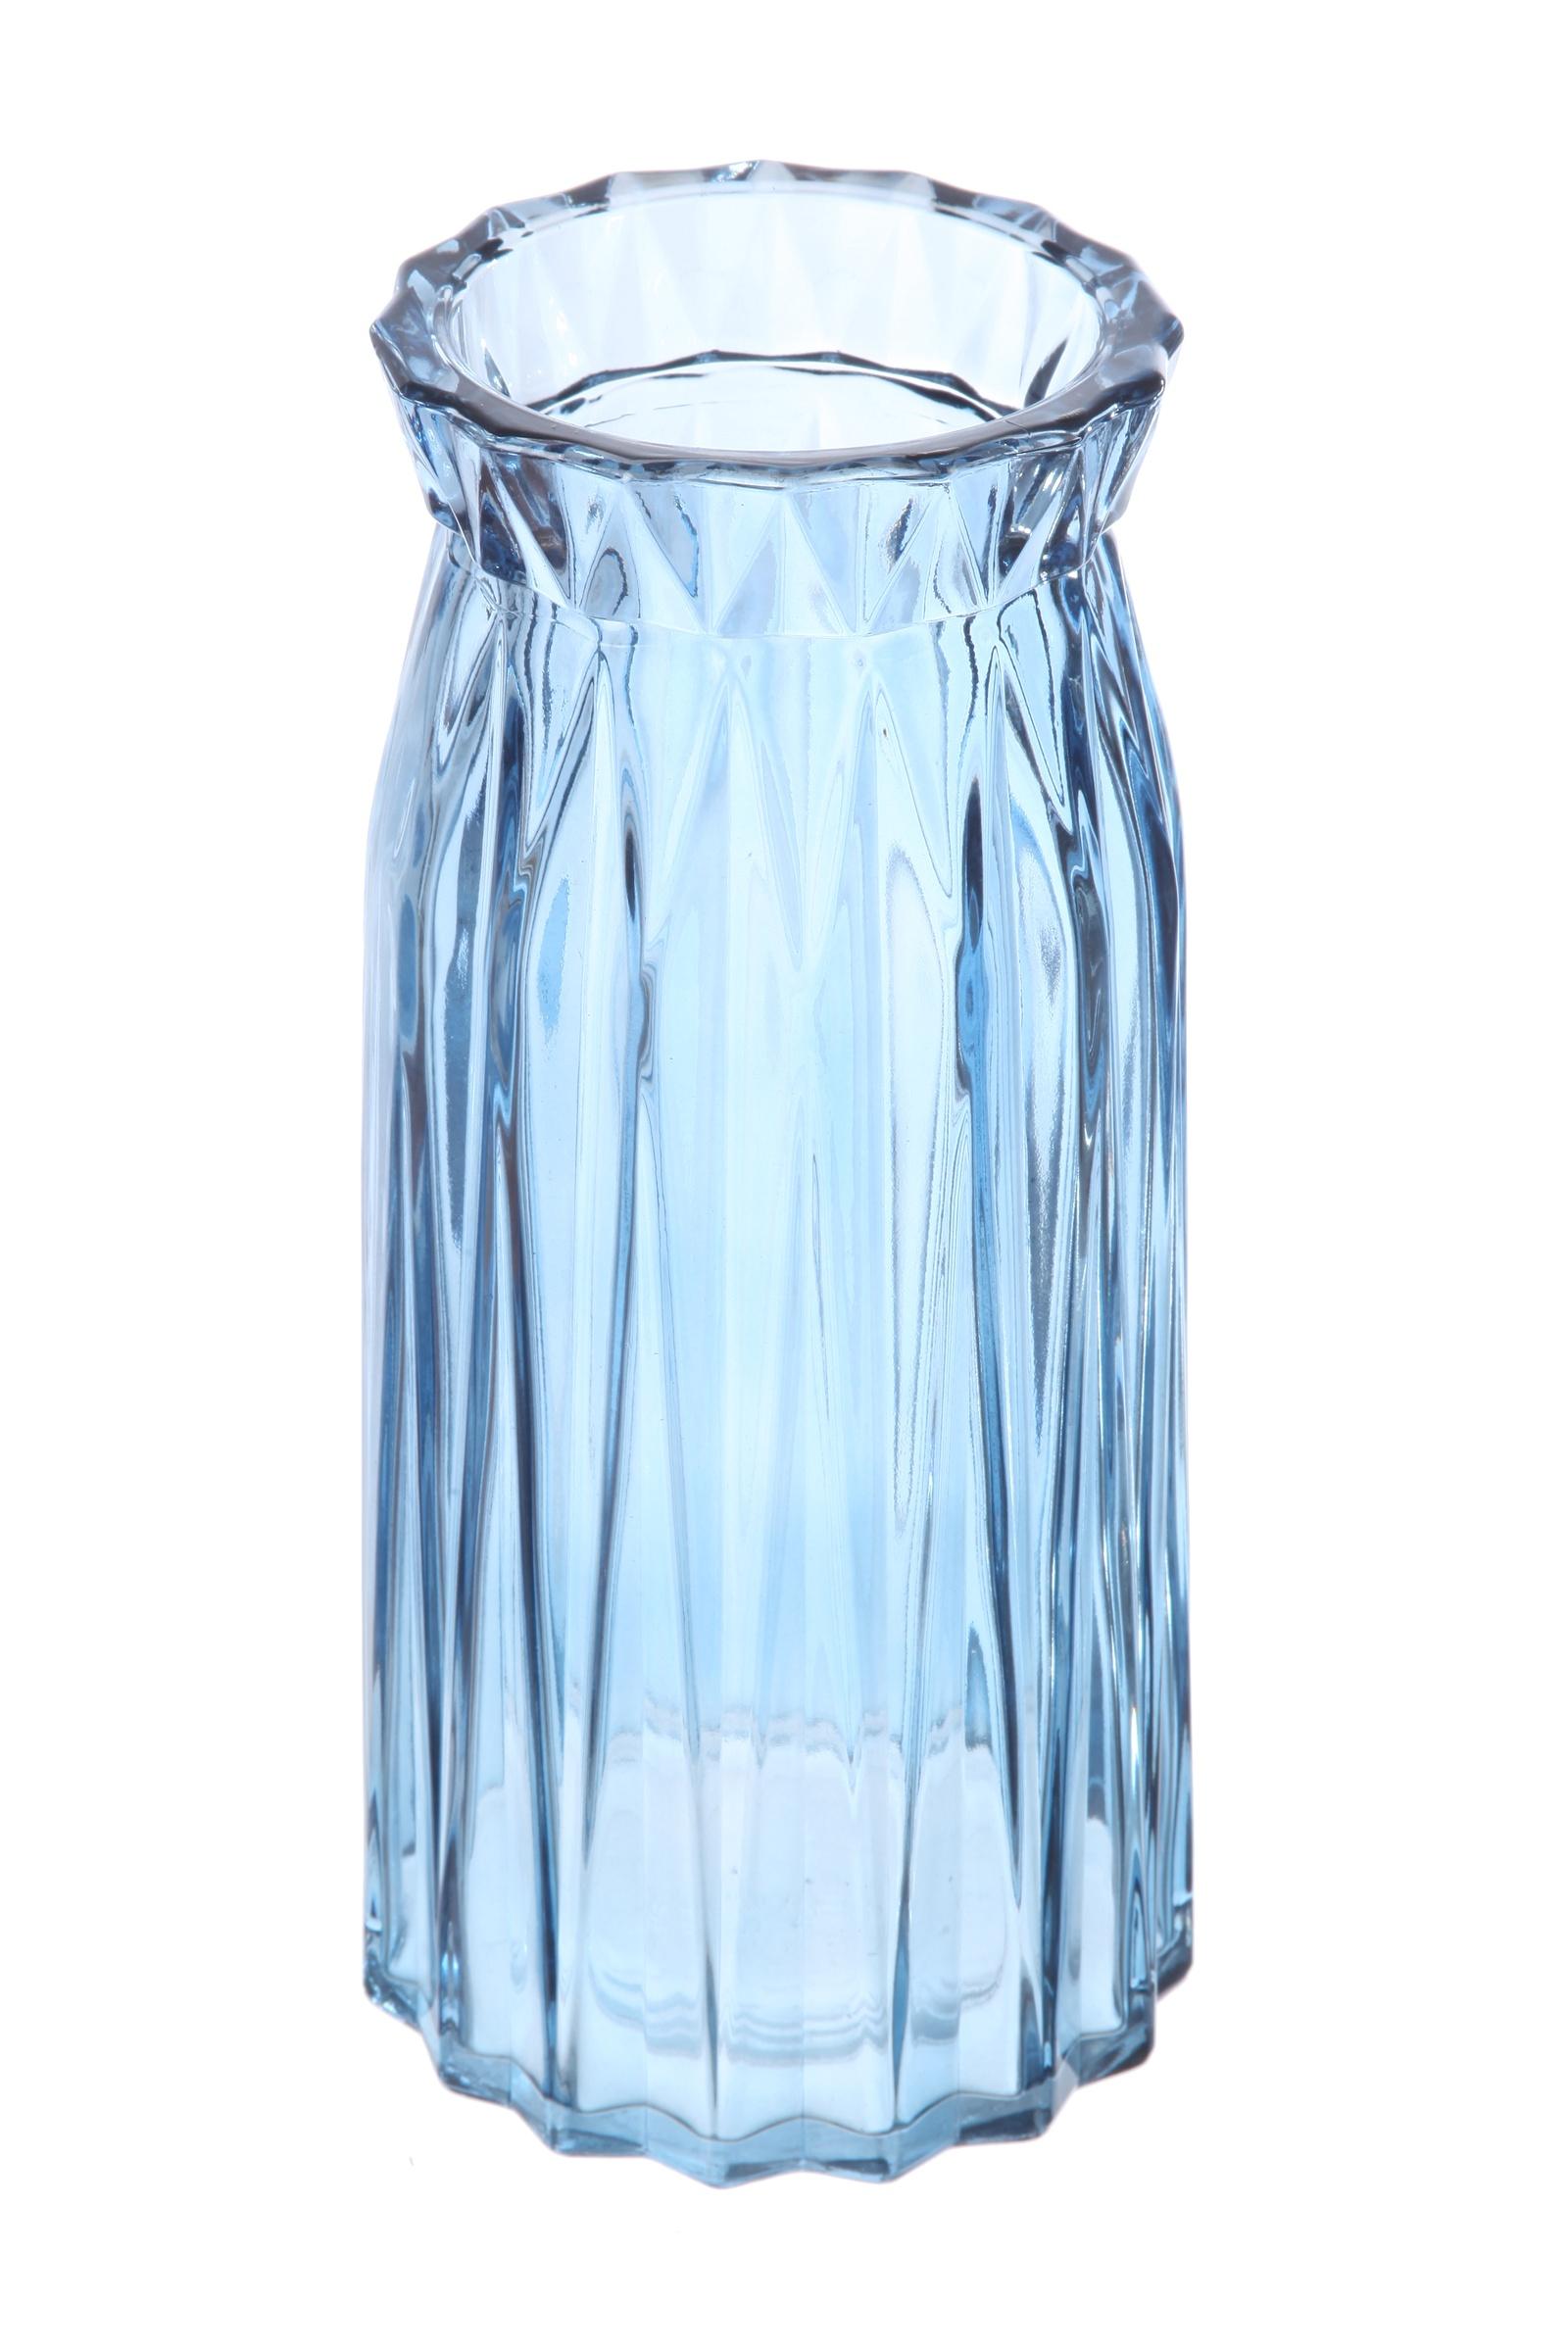 Ваза IsmatDecor Стеклянная ваза, ST-9 голубой, голубой